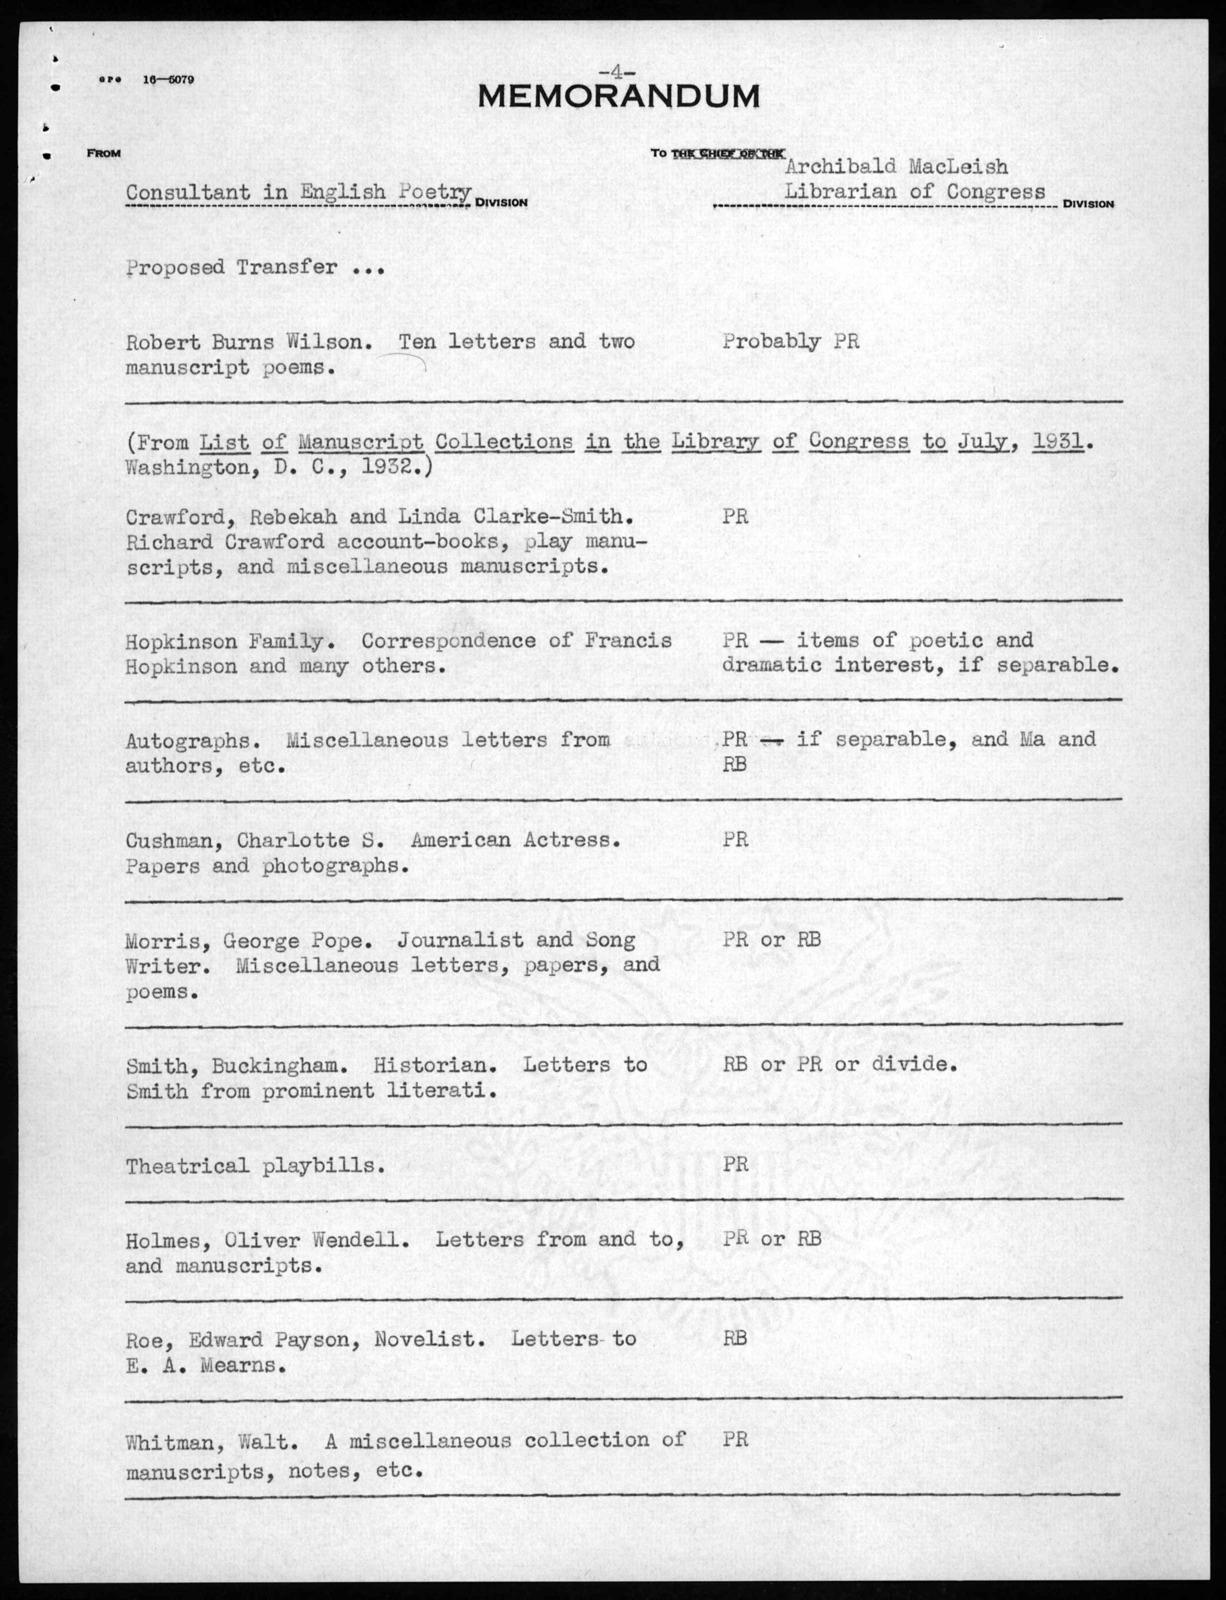 Memorandum from Joseph Auslander to Archibald MacLeish, April 9, 1940